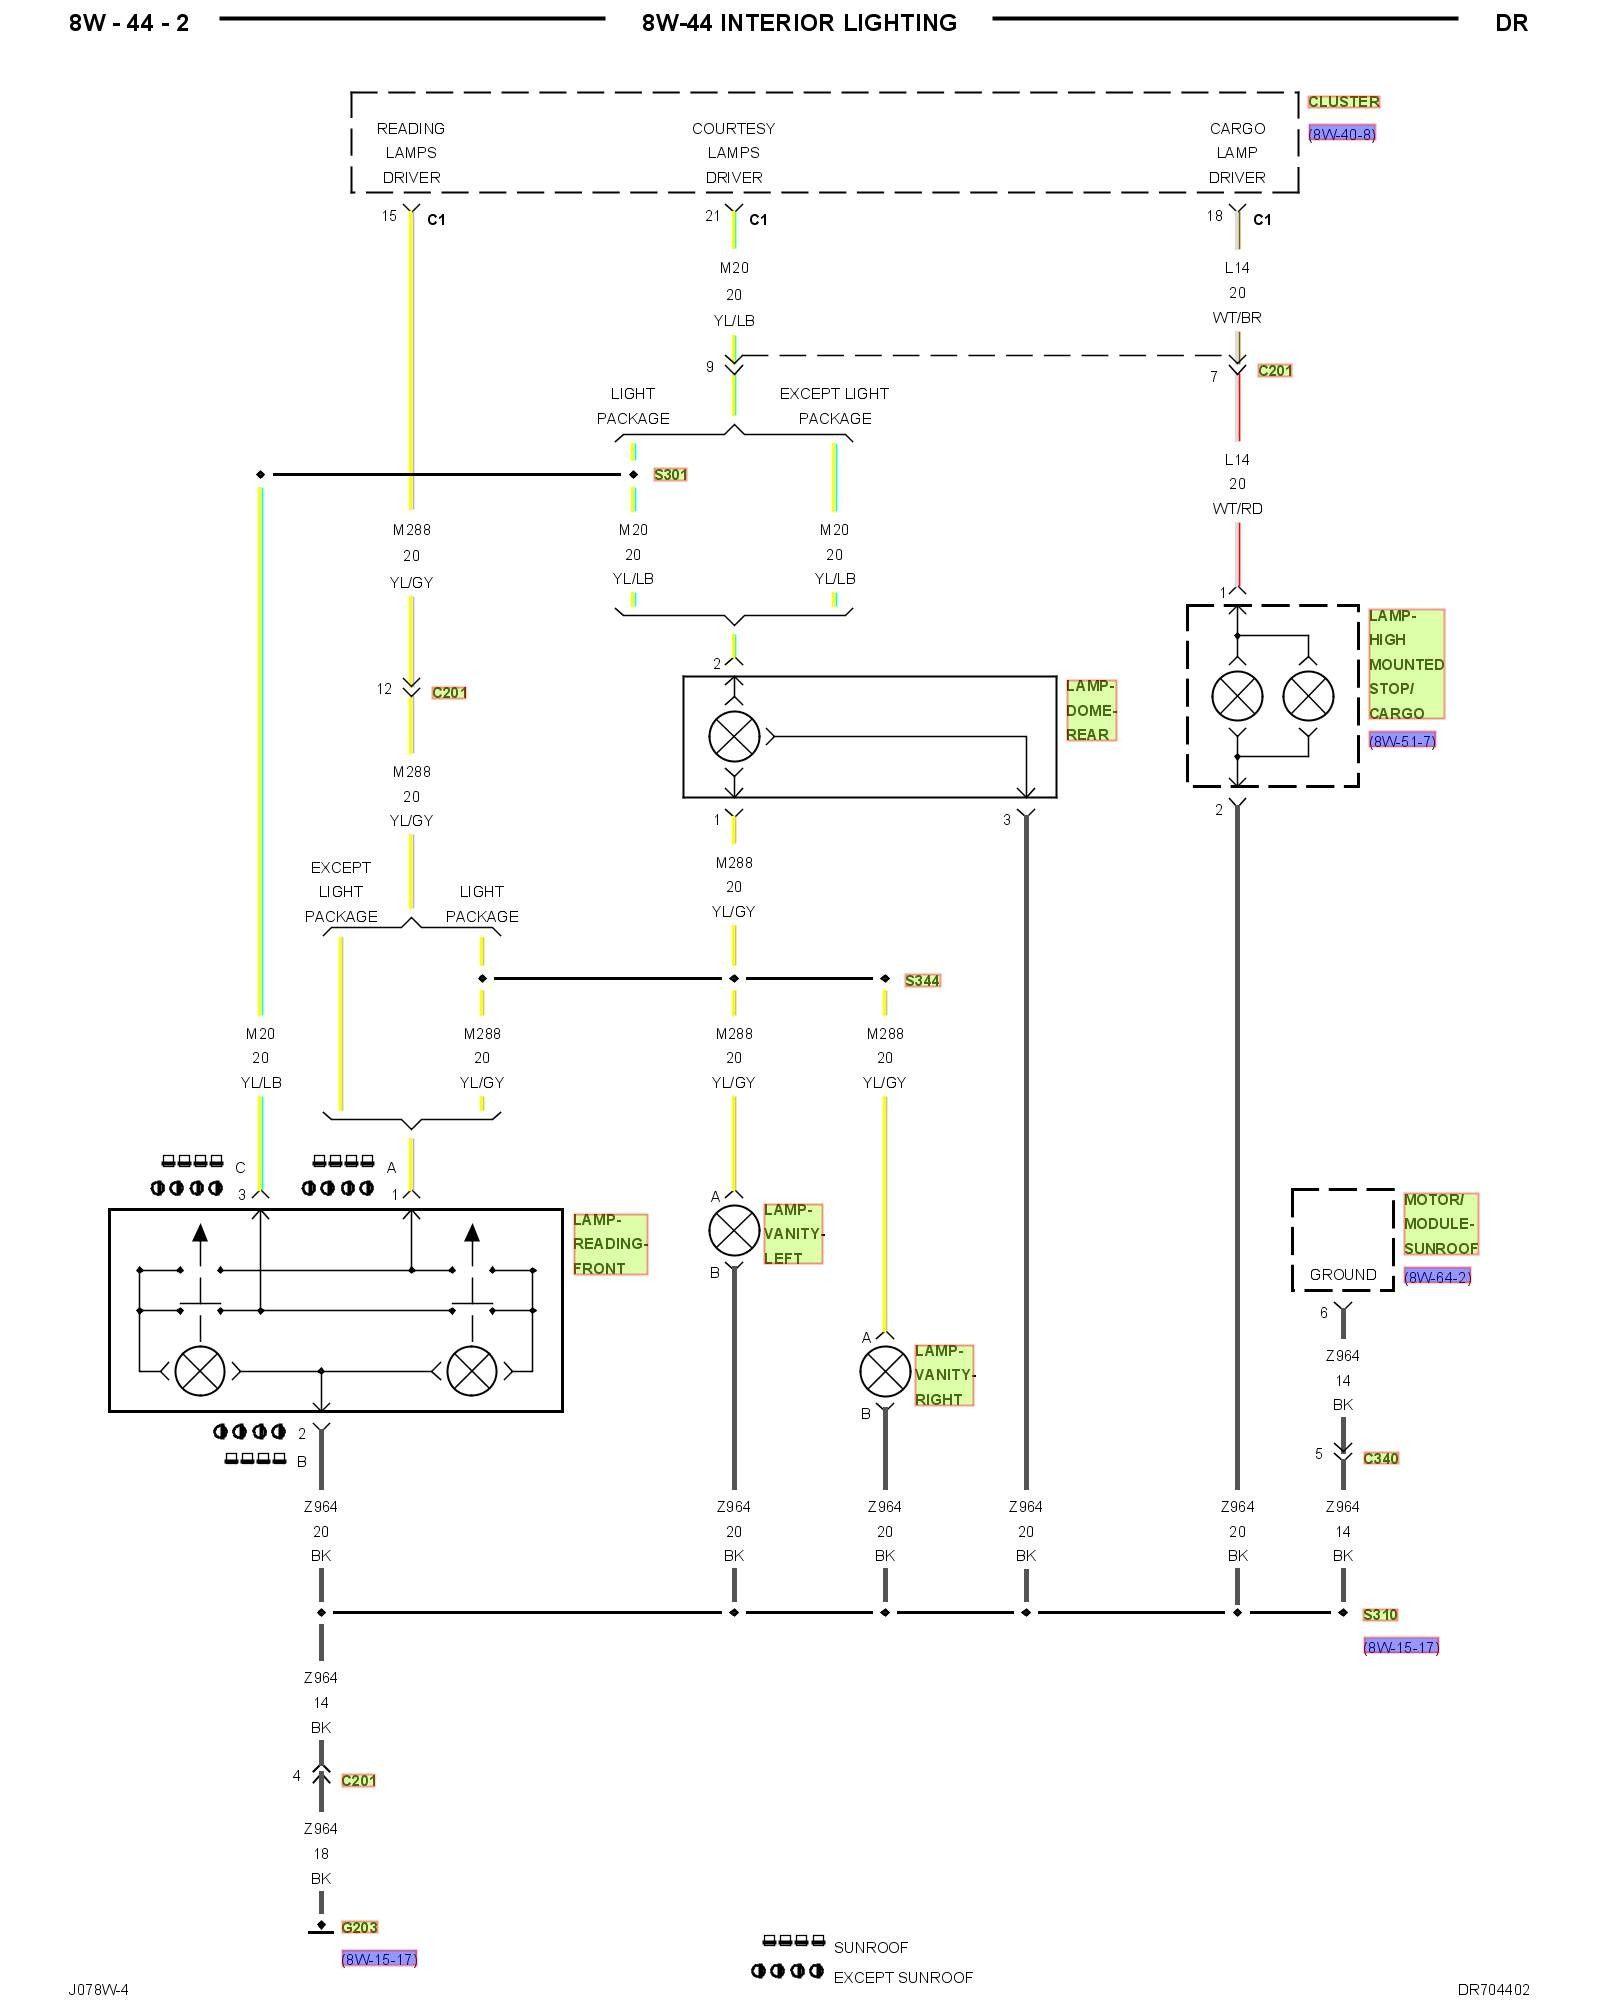 1999 Dodge Ram 2500 Headlight Dimmer Switch Wiring Diagram